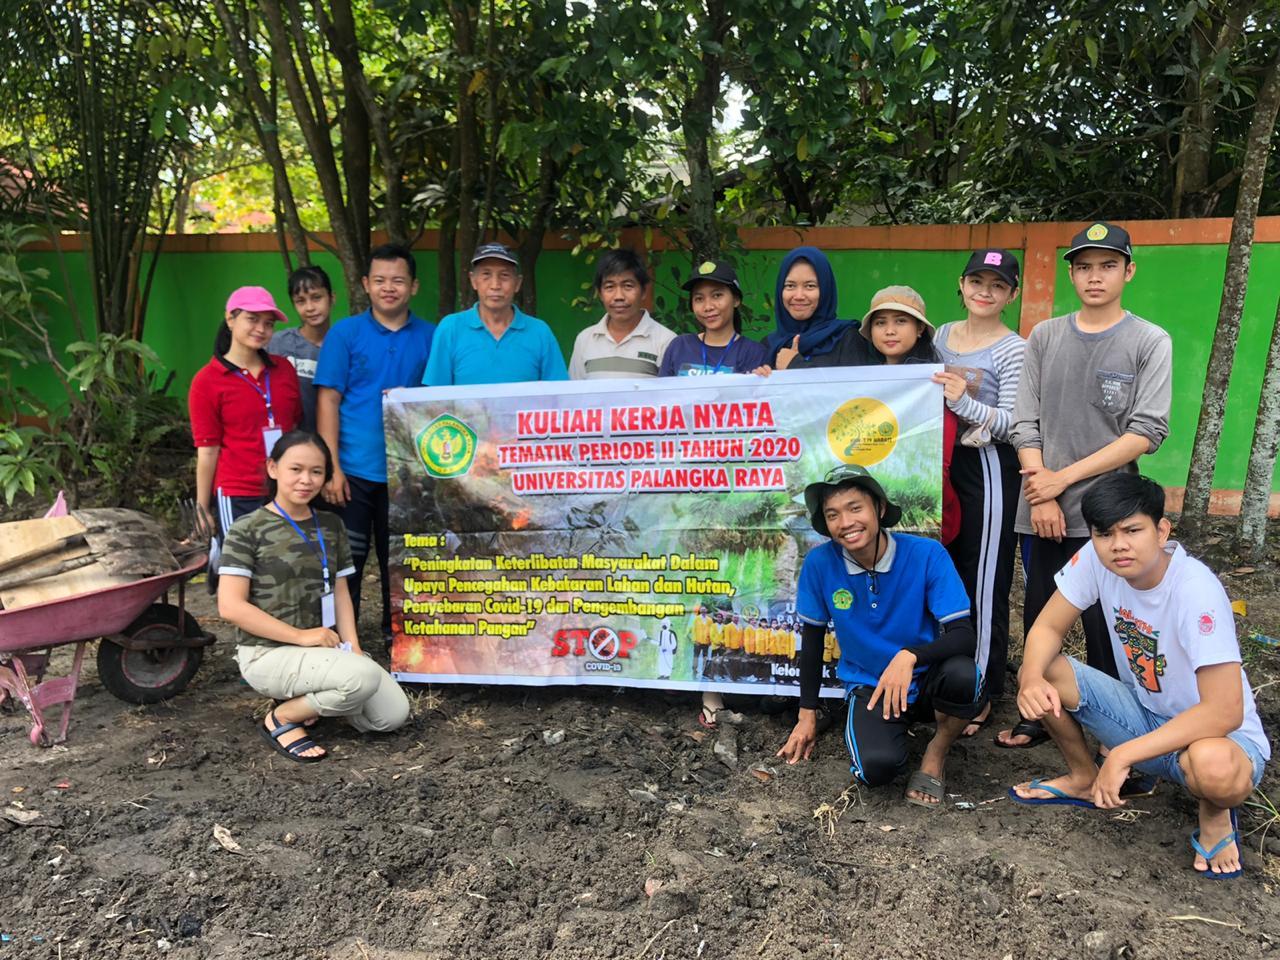 Mahasiswa UPR Peduli Lingkungan